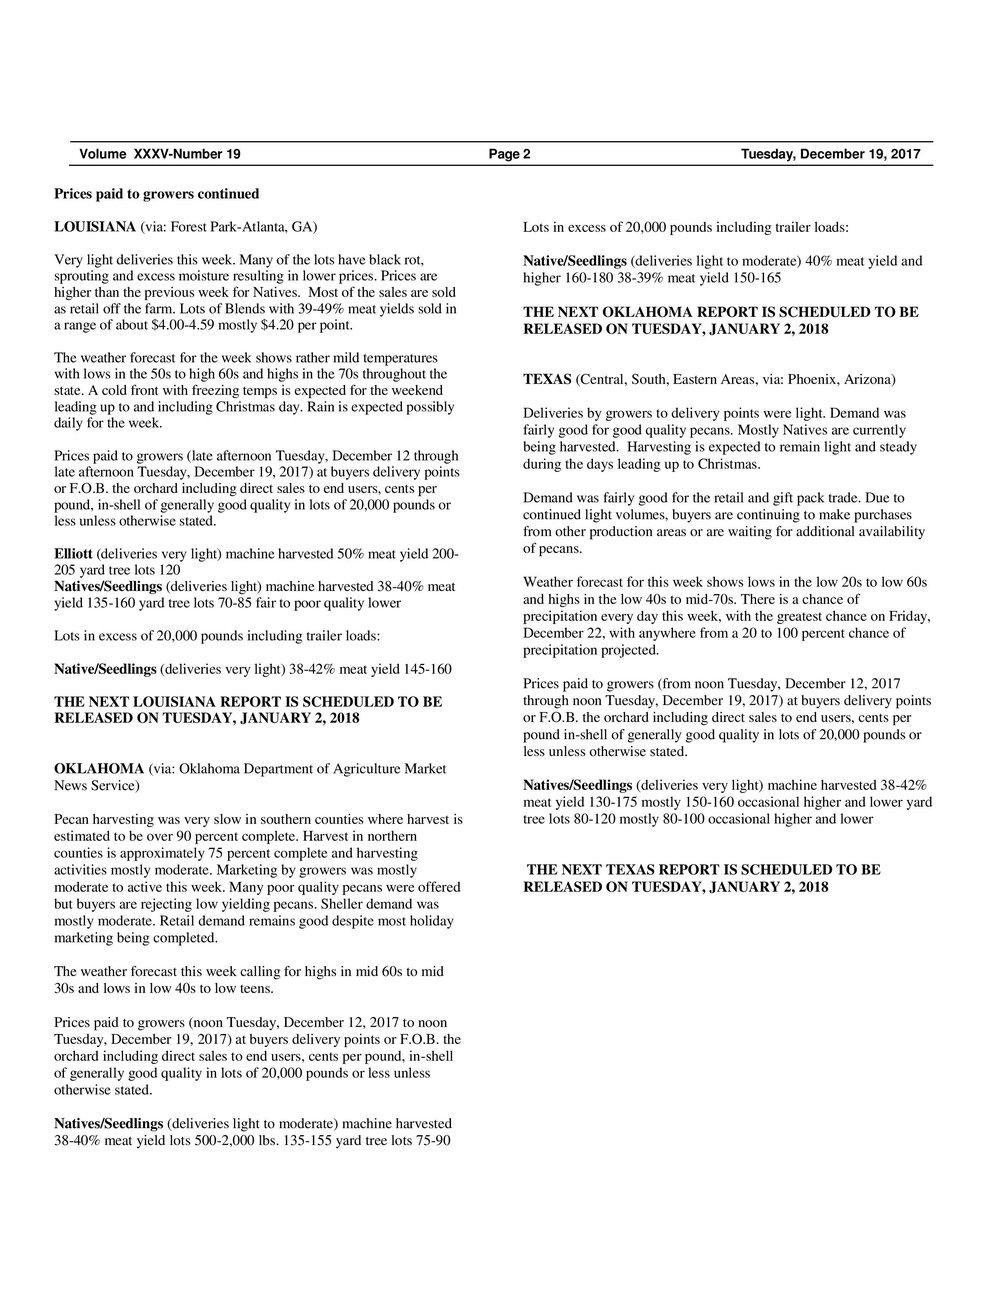 USDA Pecan Report 12-19-2017-page-002.jpg